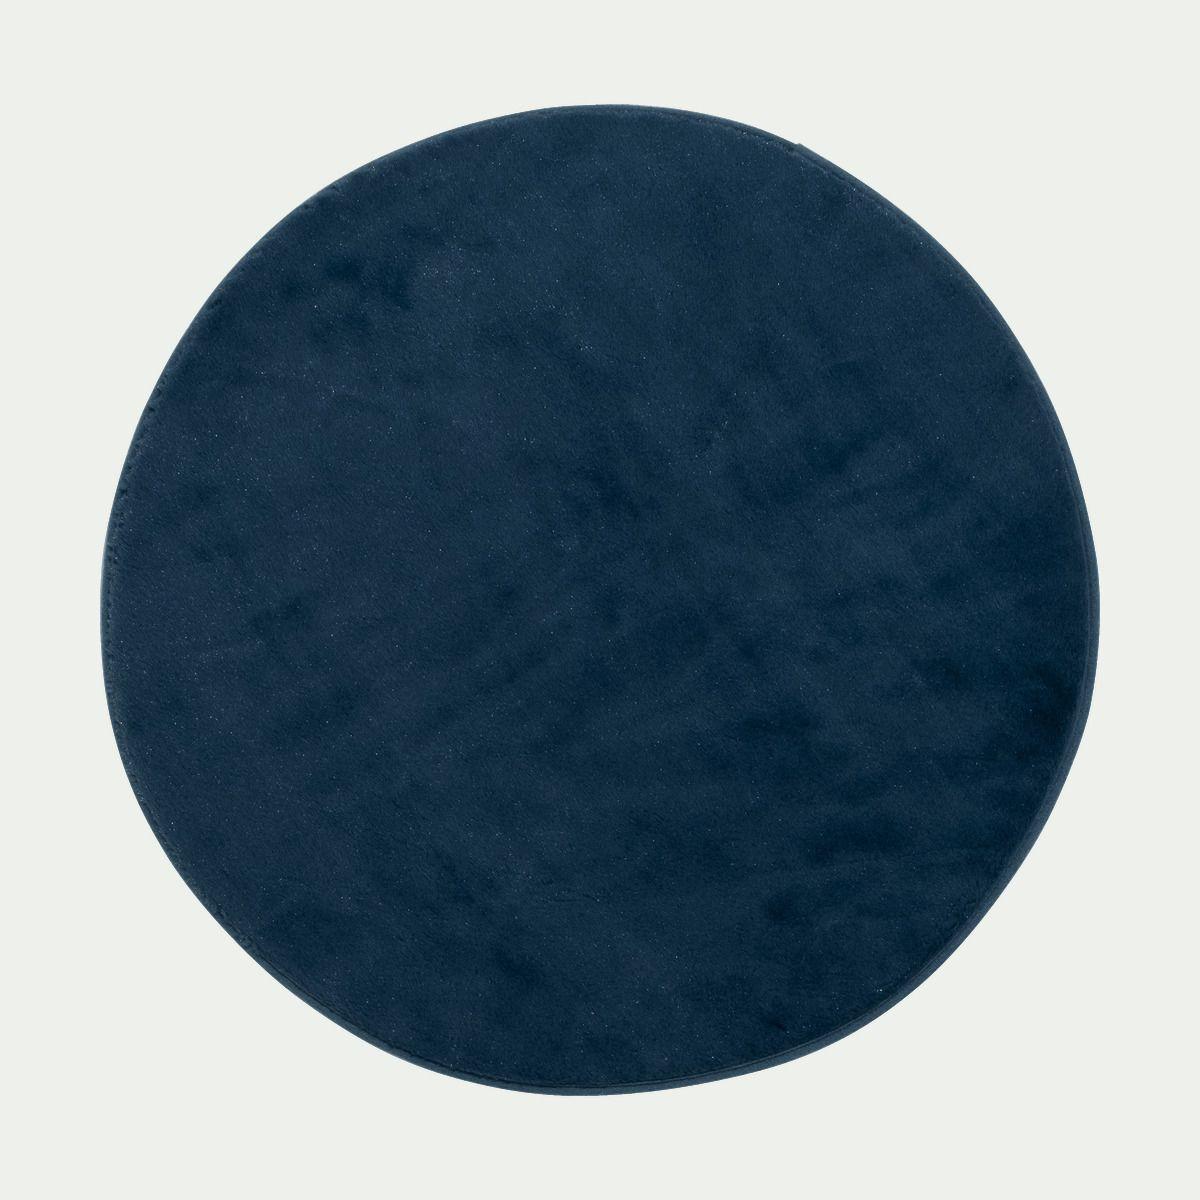 tapis rond imitation fourrure bleu